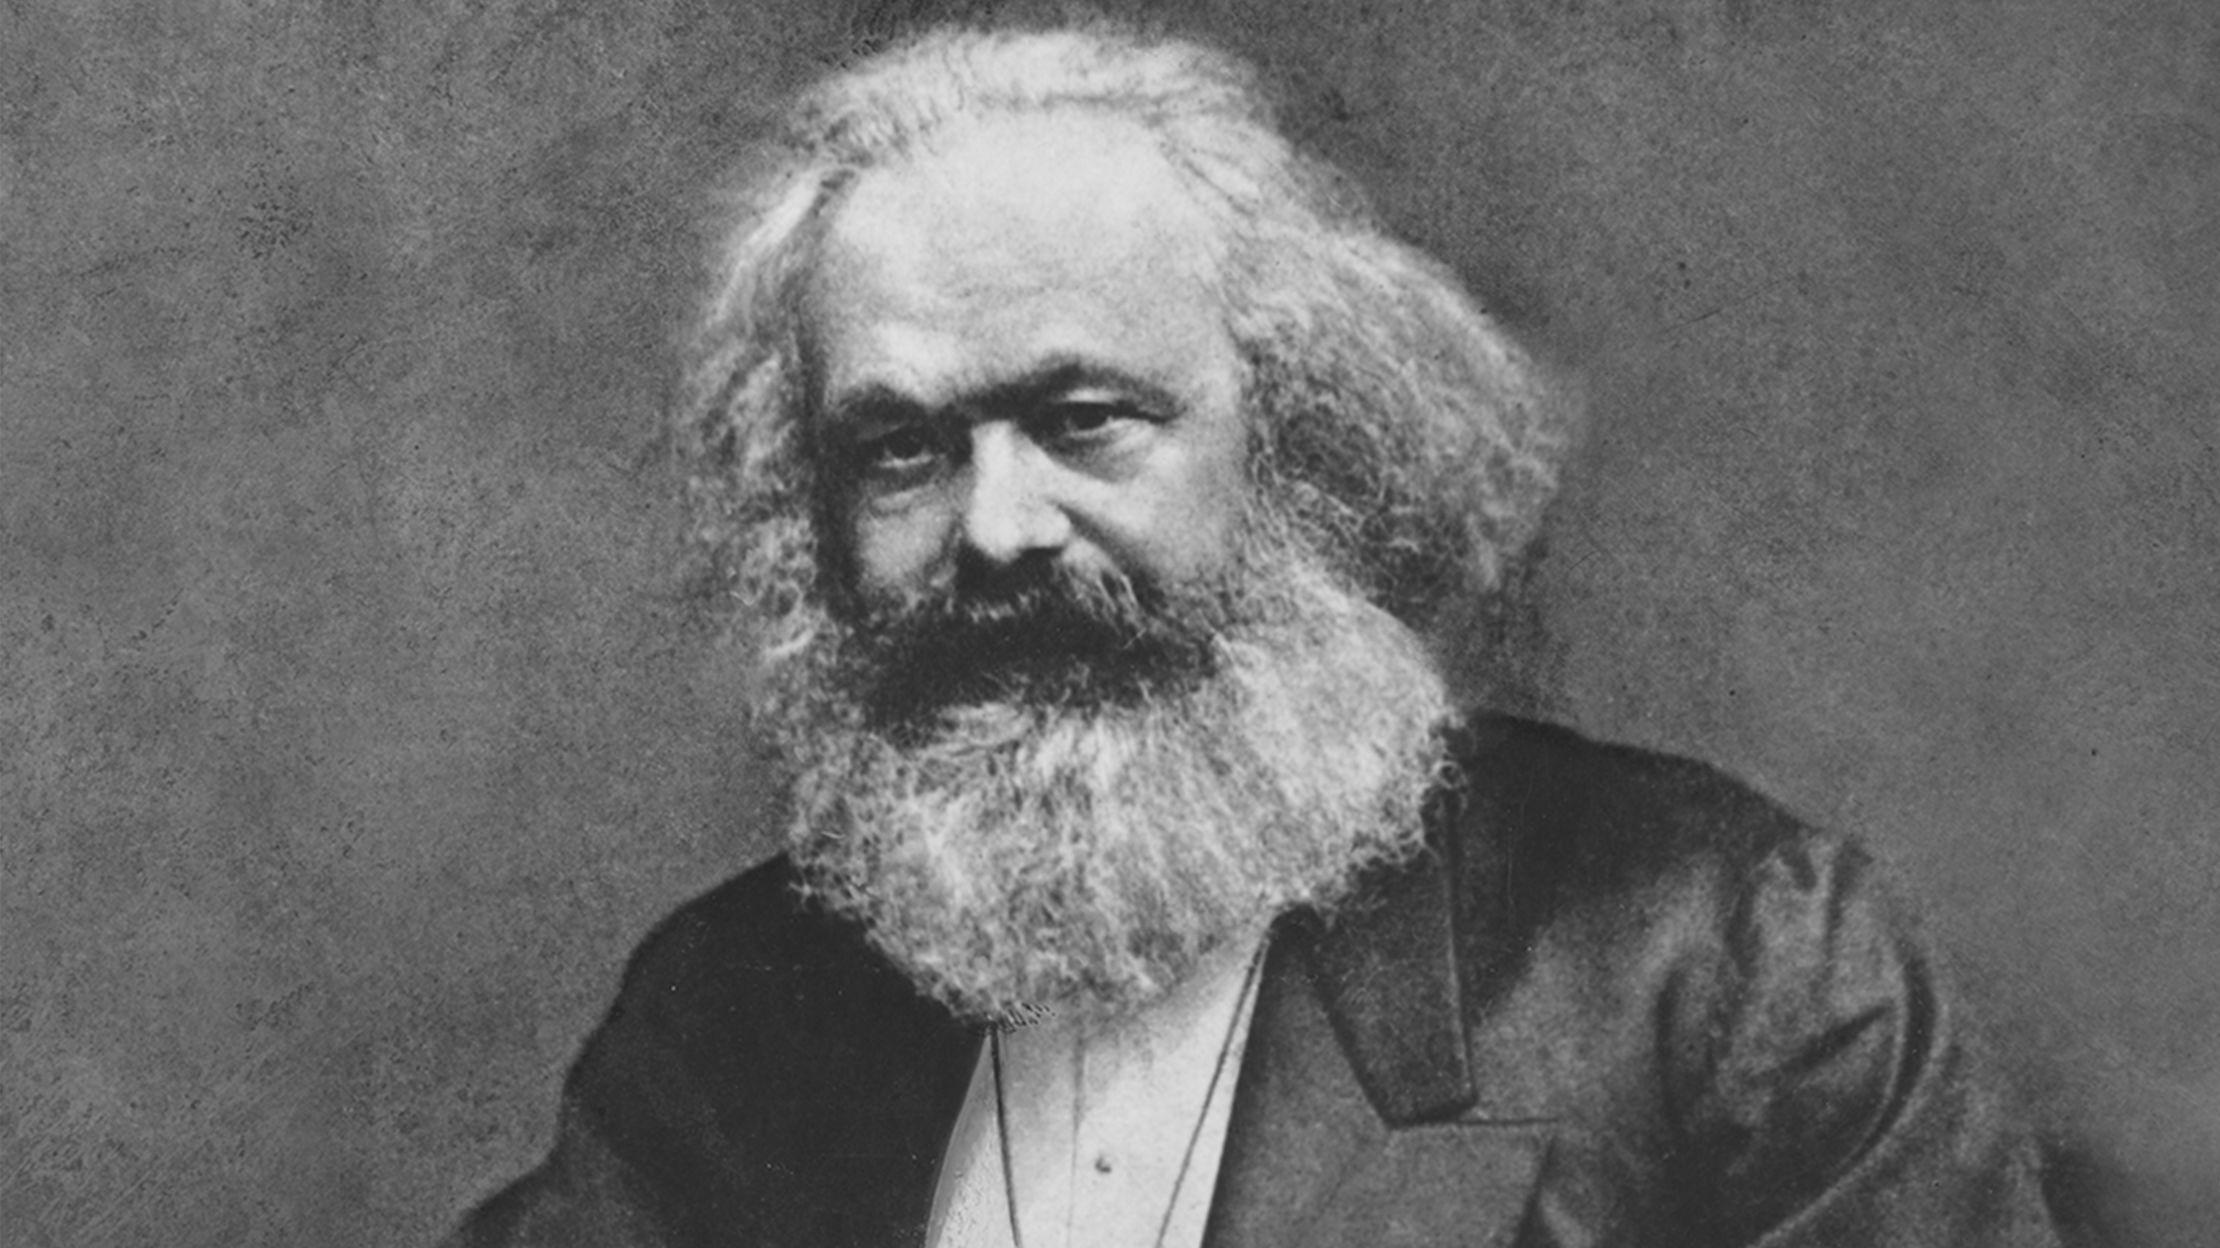 Marx was a colonizer, not a communist